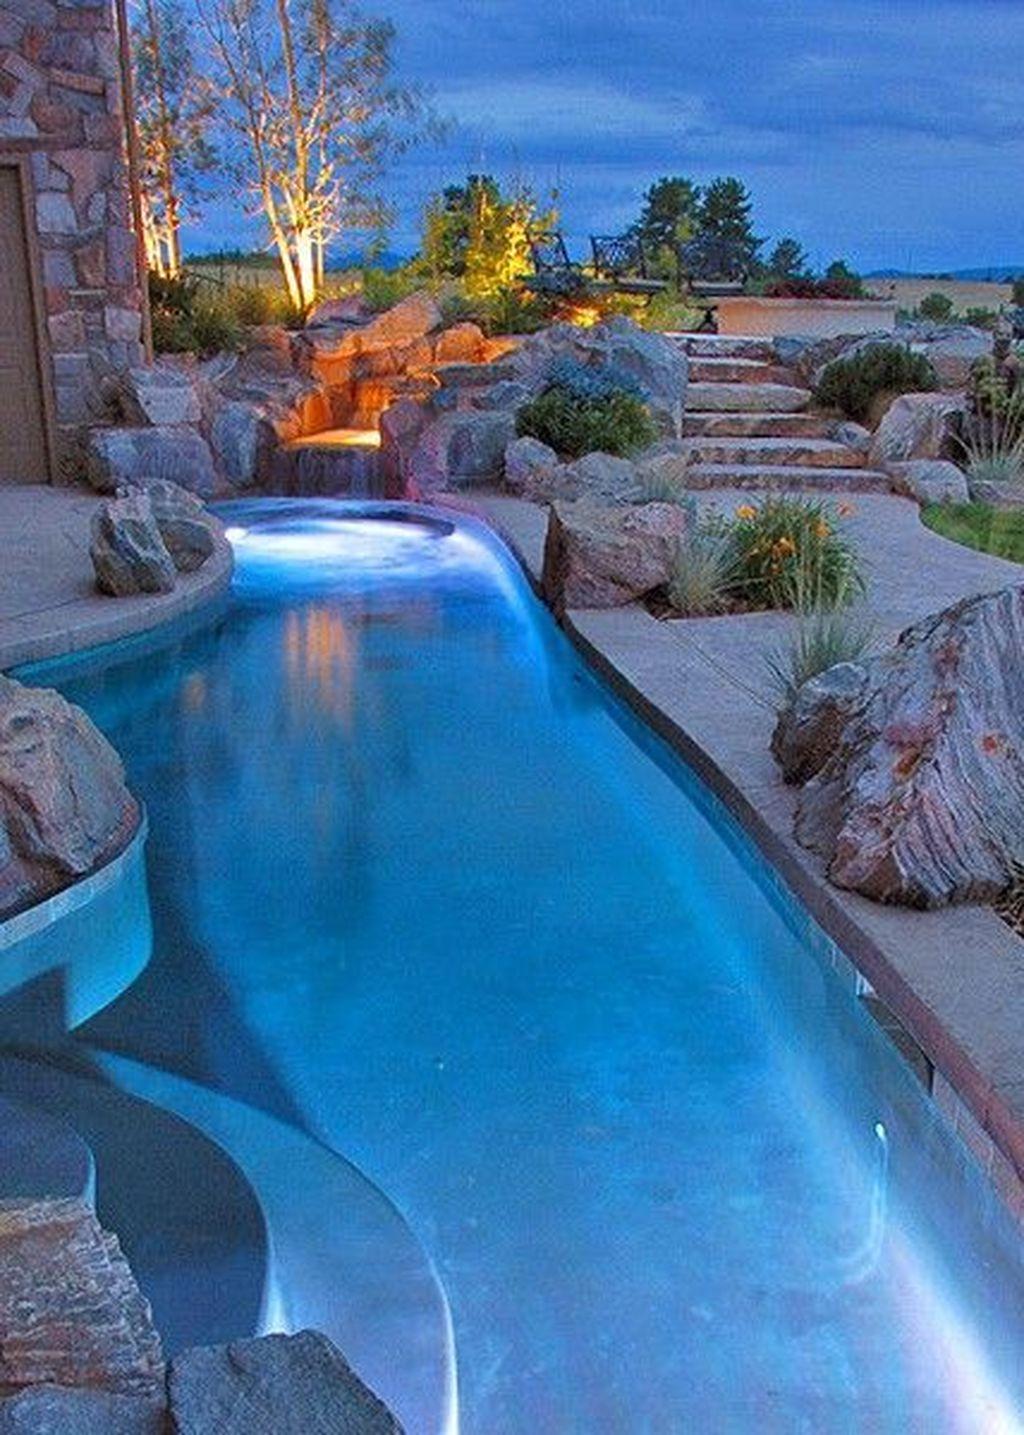 Cute Cabana Swimming Pool Design Ideas That Looks Charming 10